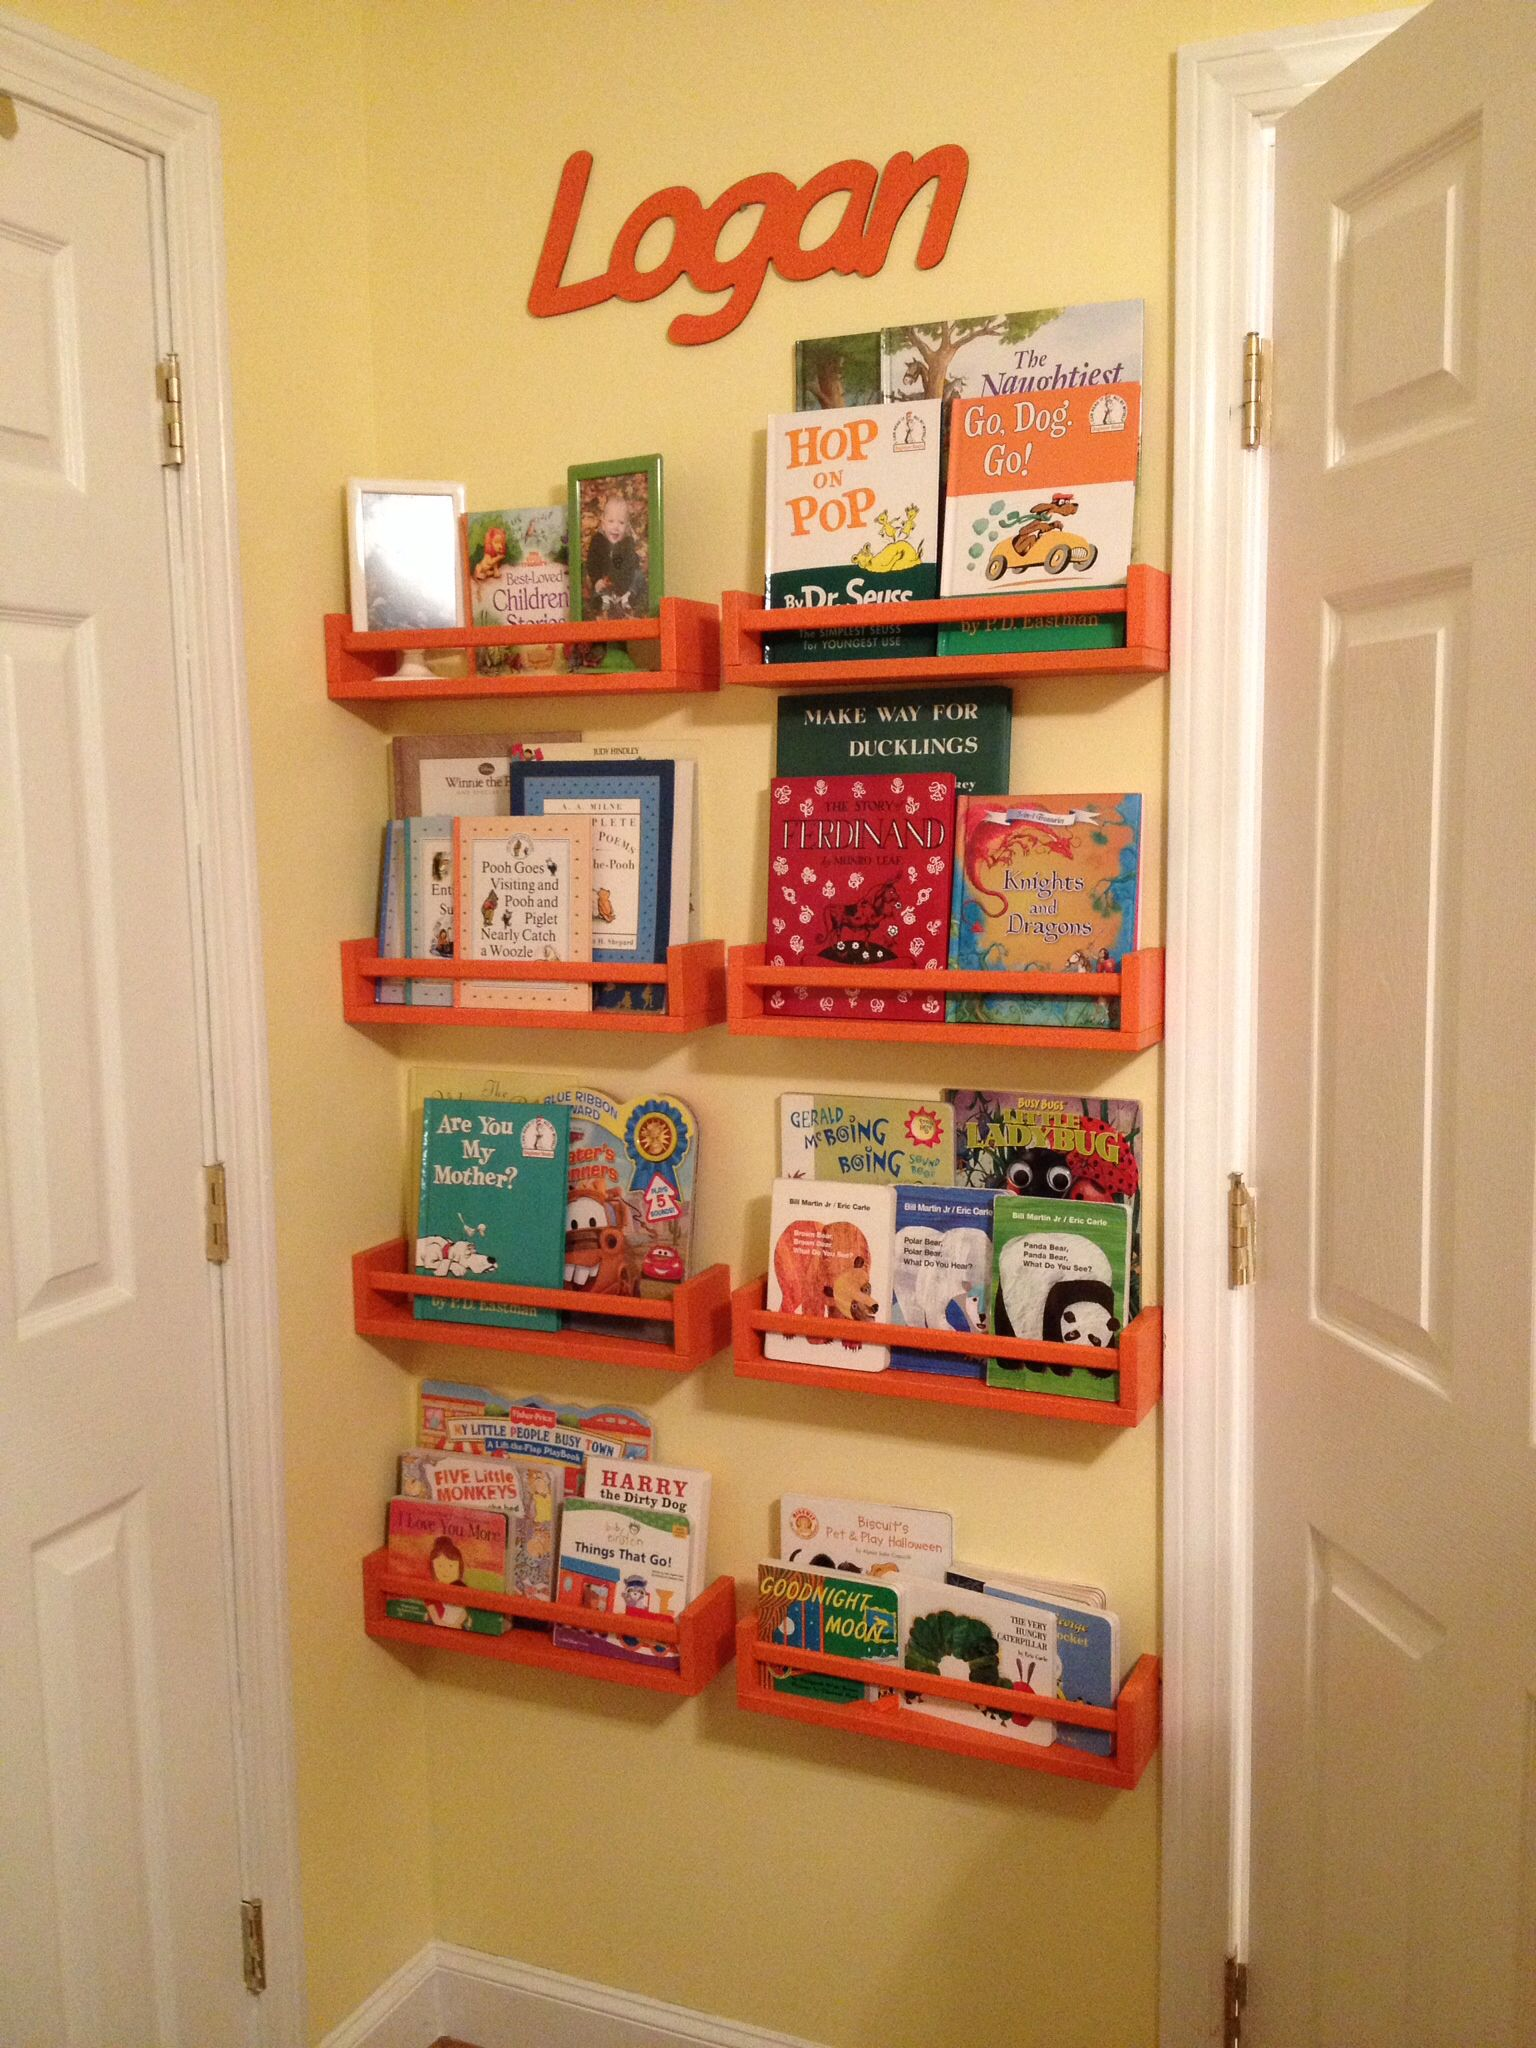 ikea spice rack book shelves nursery pinterest ikea spice